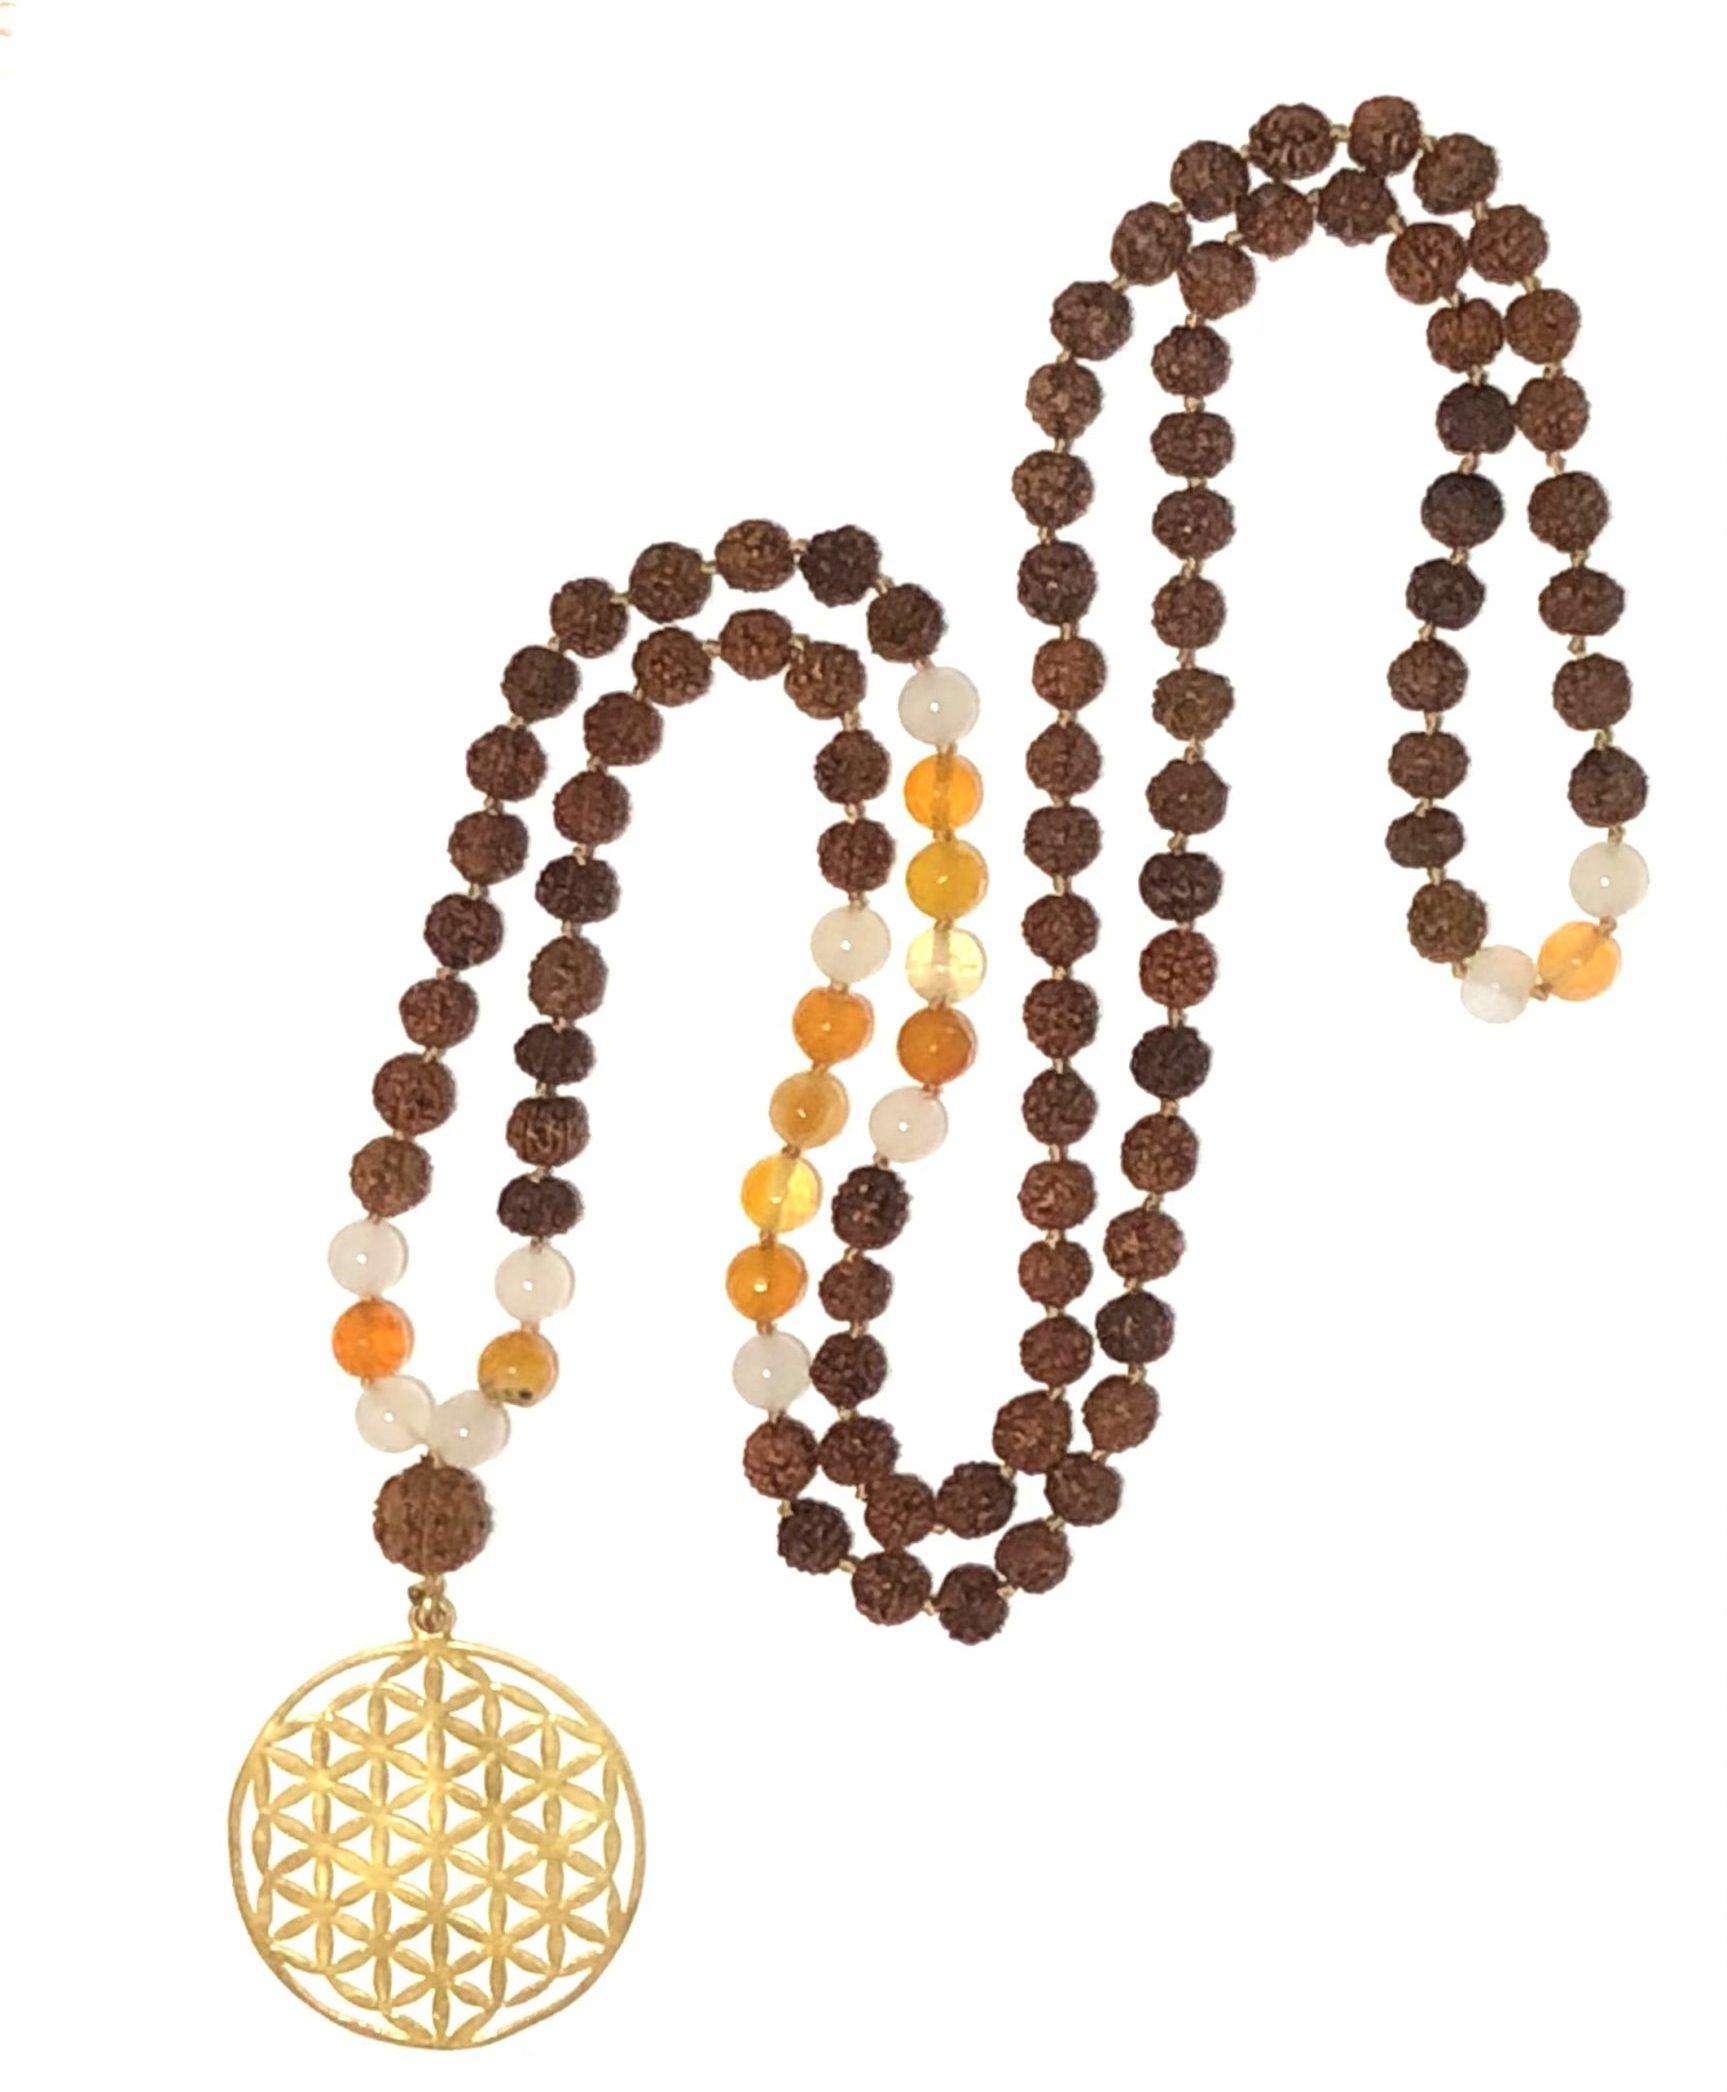 Protection Gold Beach Pottery Jizo Bodhisattva Icon Golden Halo Healing Shard Flower Meditation Robe Lotus Compassion